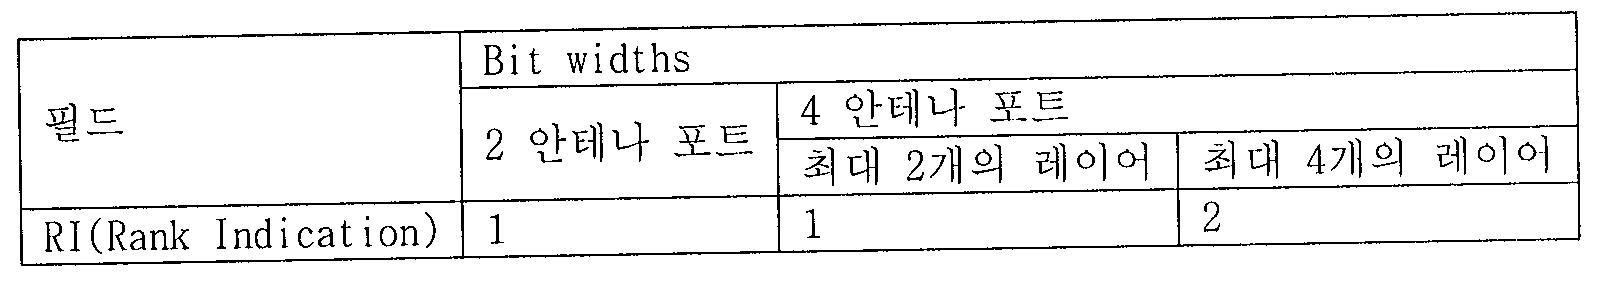 Figure 112011502155947-pat00021